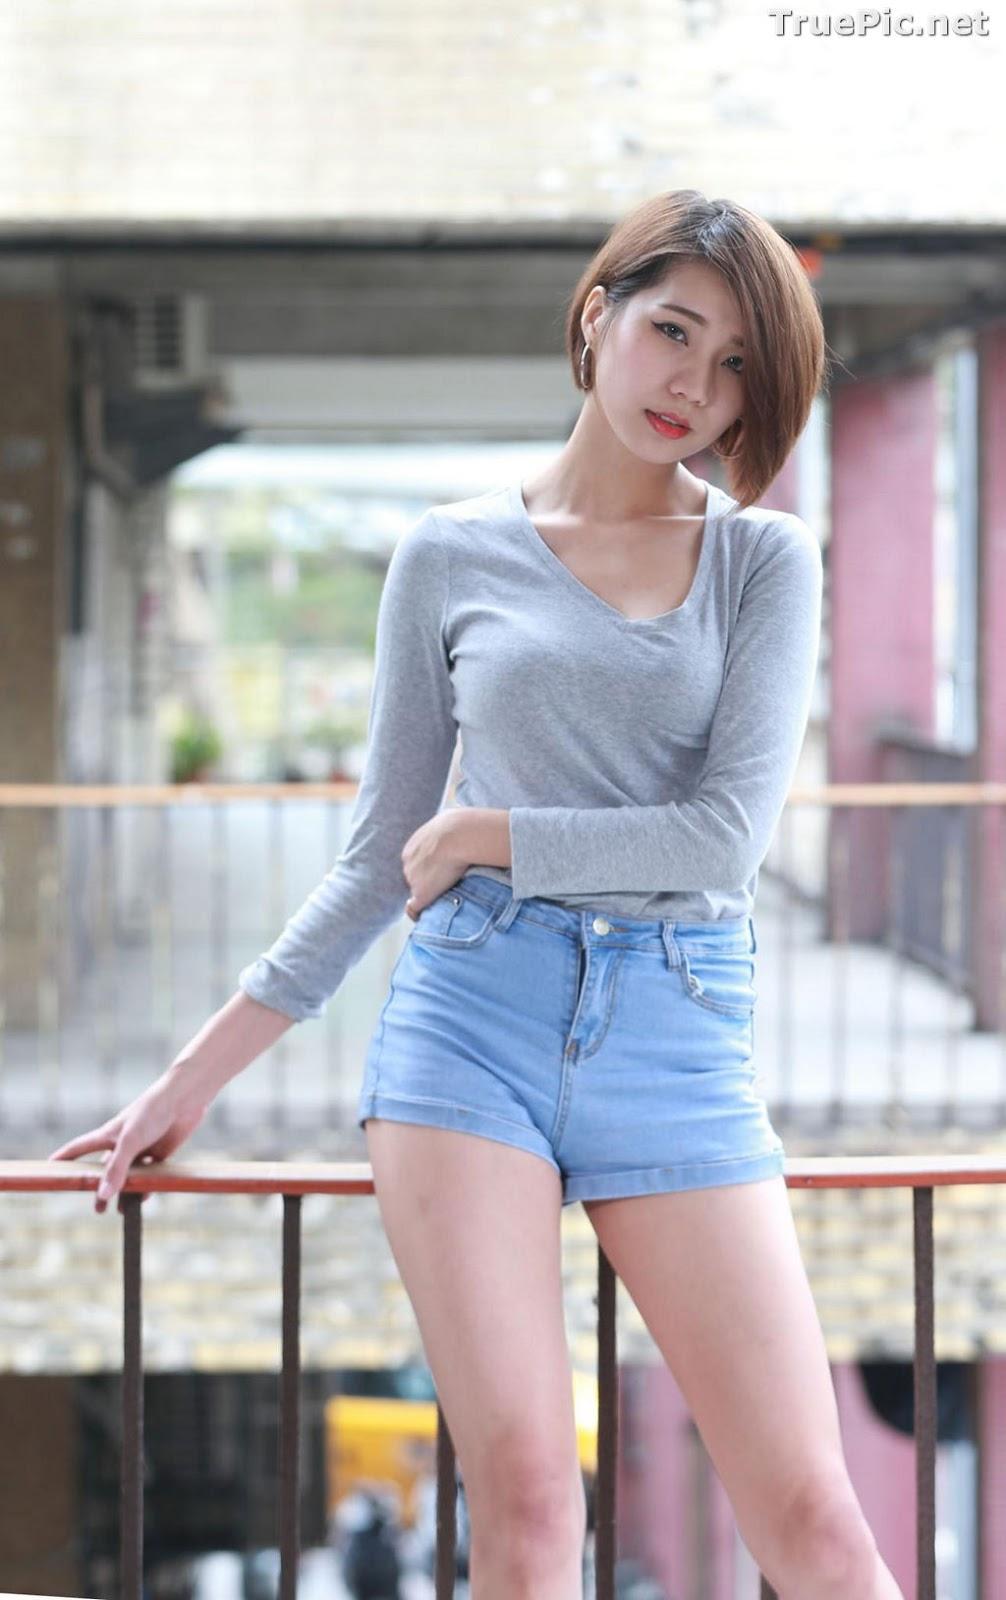 Image Pretty Taiwan Showgirl - 黃竹萱 - Beautiful Long Legs Girl - TruePic.net - Picture-9